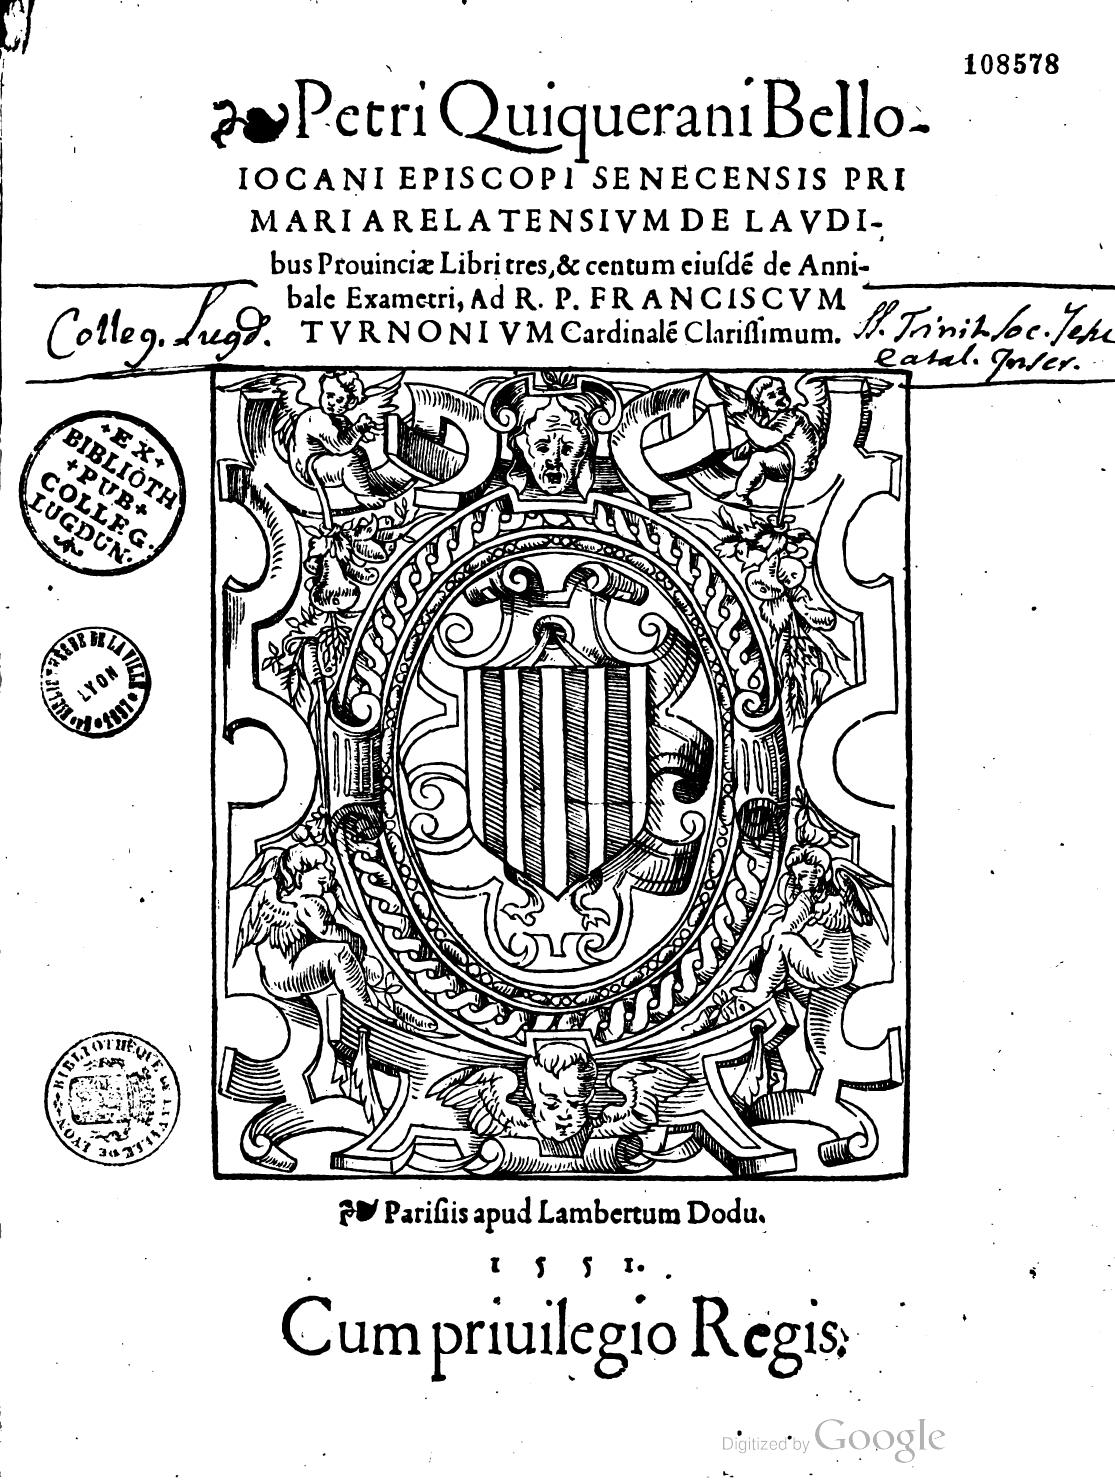 Pierre de Quiqueran de Beaujeu, De laudibus Provinciae, 1551